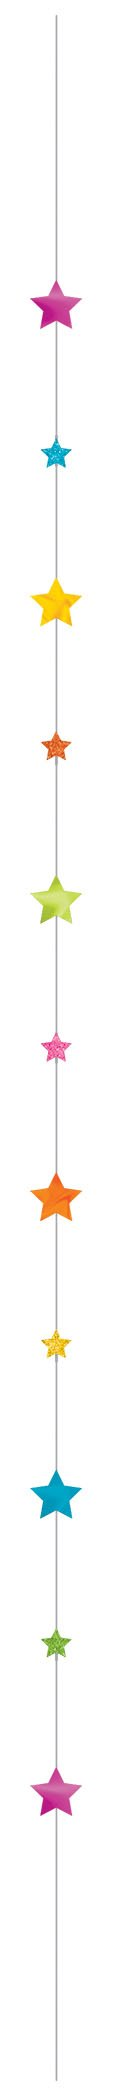 Balloon Fun Strings Stars Brights